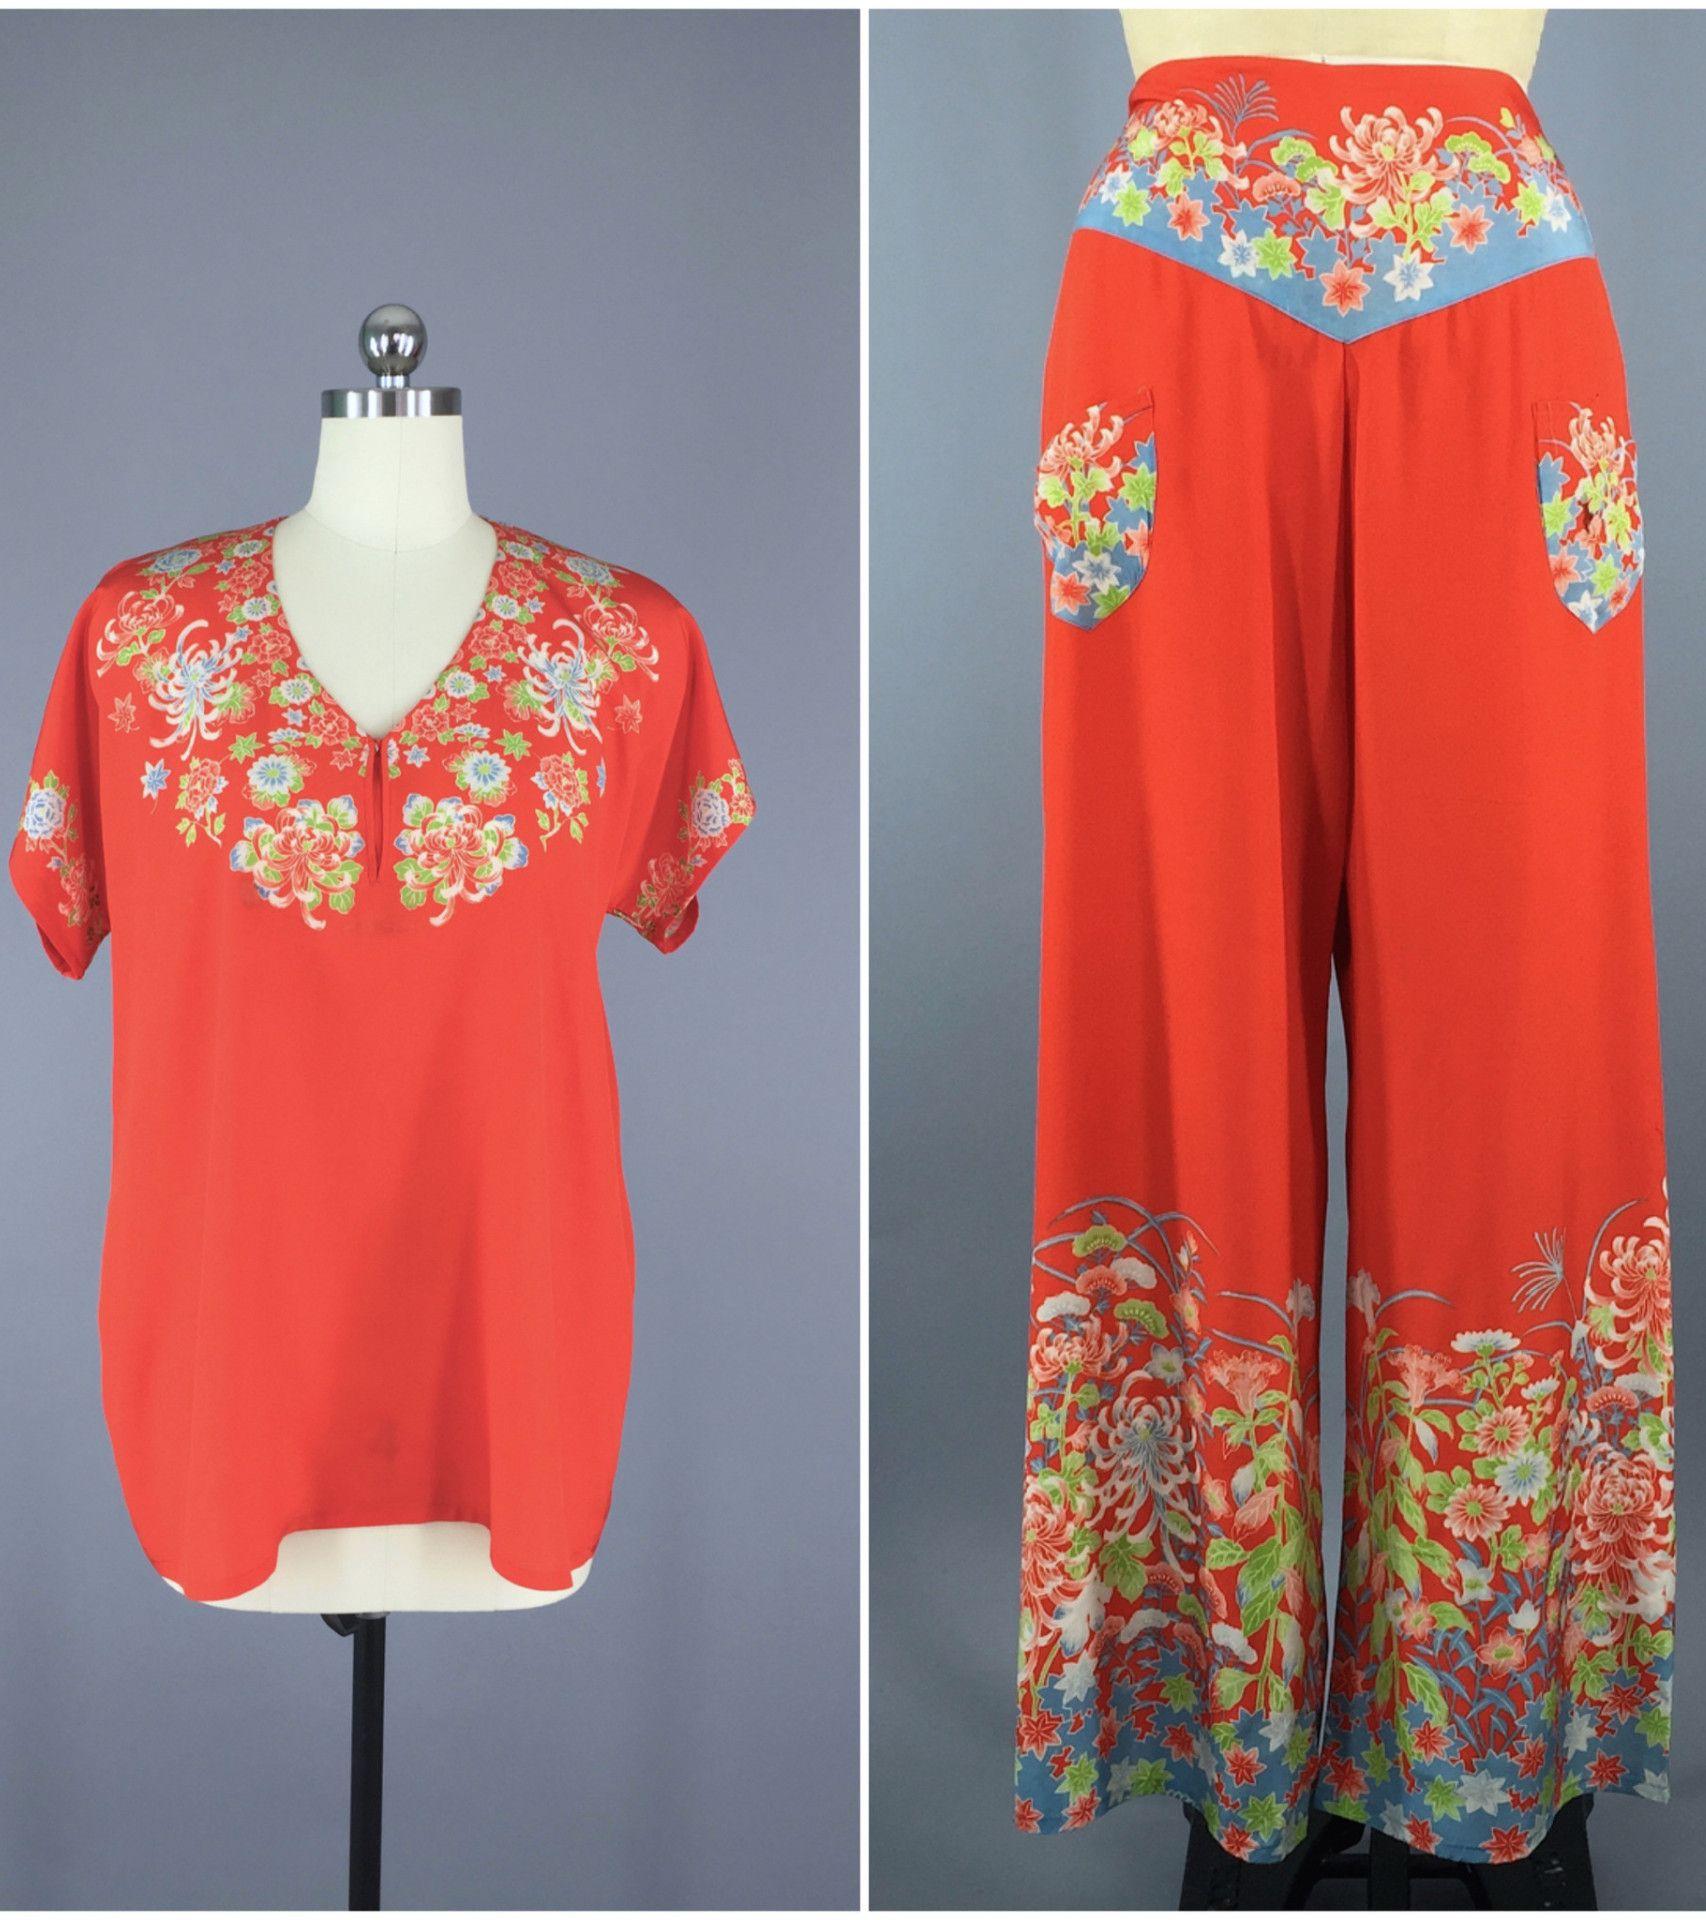 Vintage 1920s 1930s Silk Pajamas Pjs Loungewear   Flapper 20s 30s Lingerie  Boudoir   Chinoiserie Chinese Asian b93390cc4